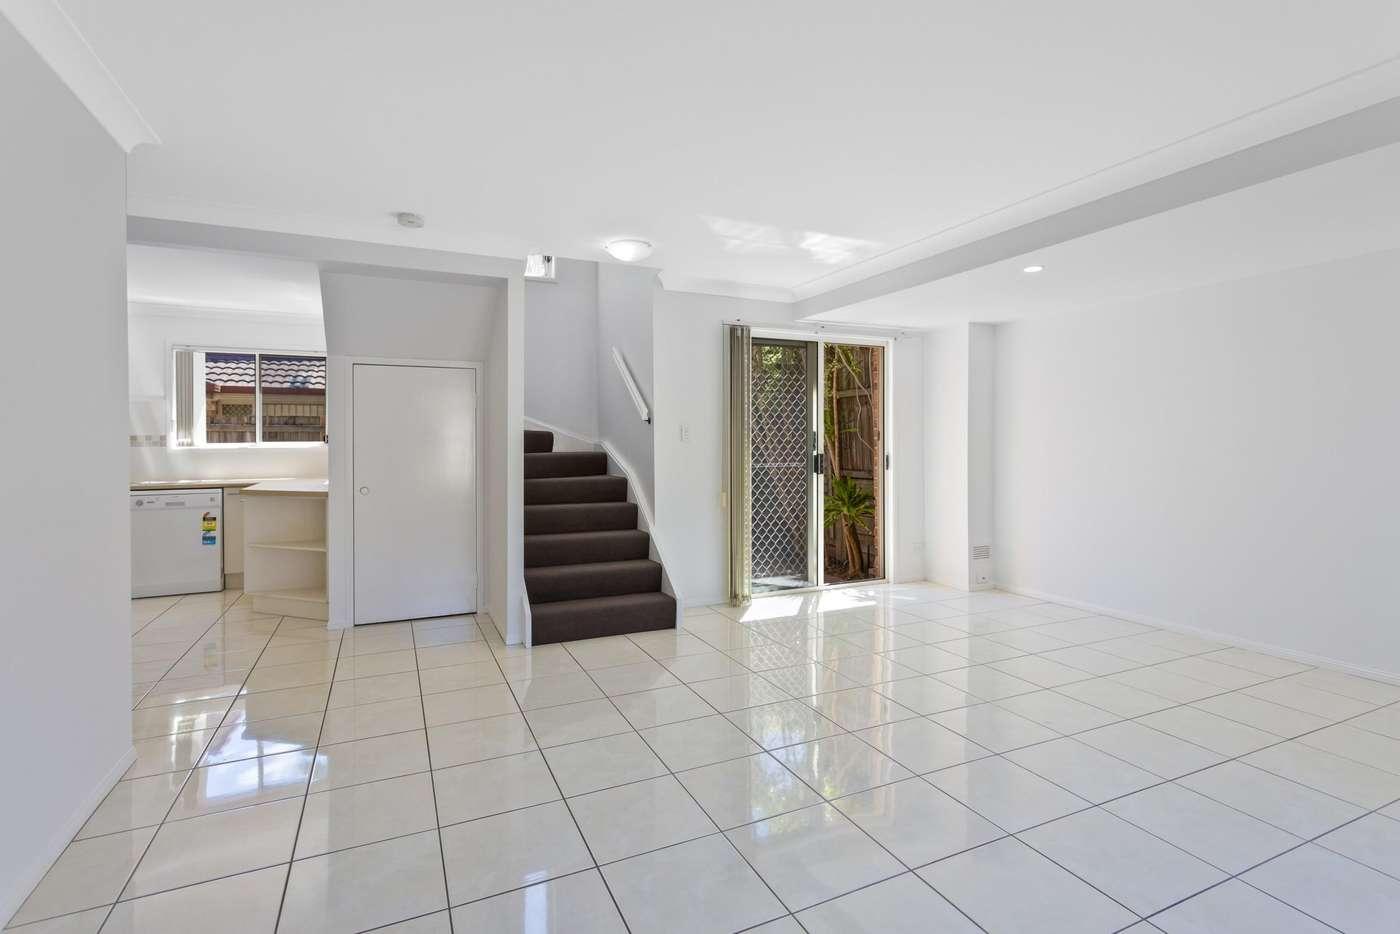 Main view of Homely townhouse listing, 23 Railton, Aspley QLD 4034